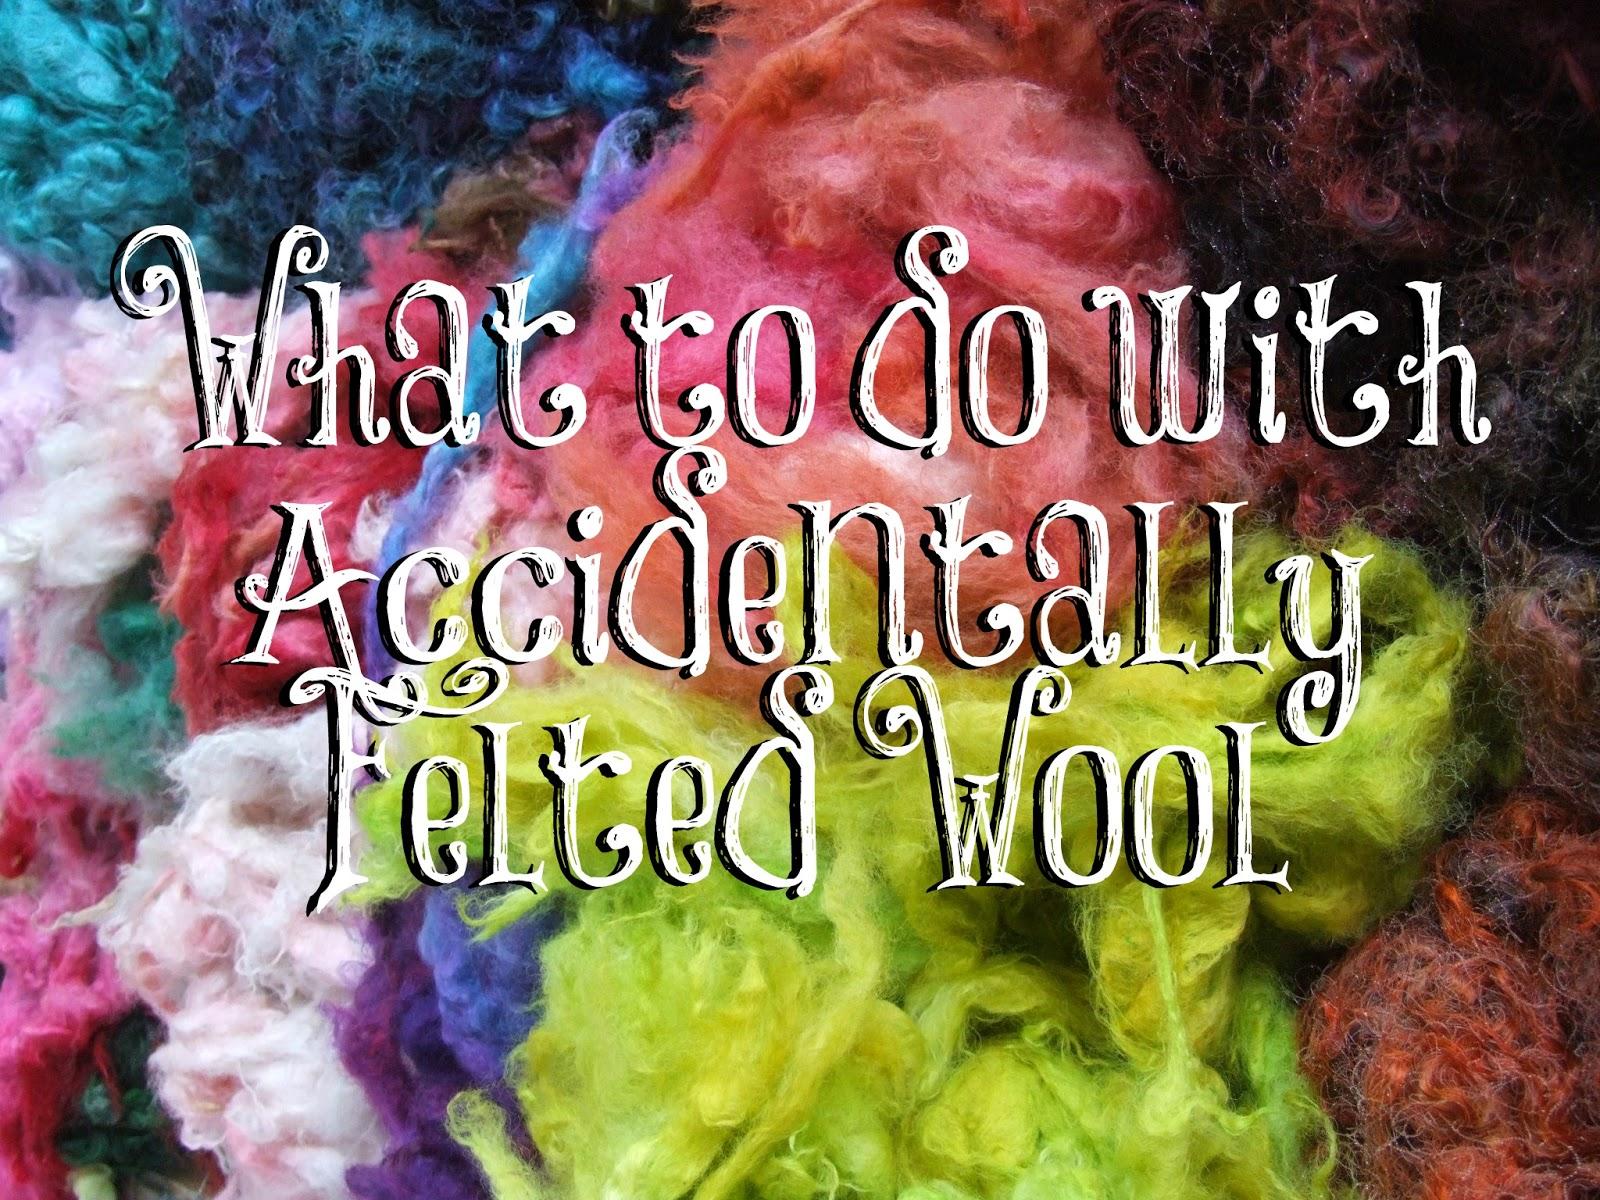 http://www.craftsy.com/blog/2015/02/accidentally-felted-wool/